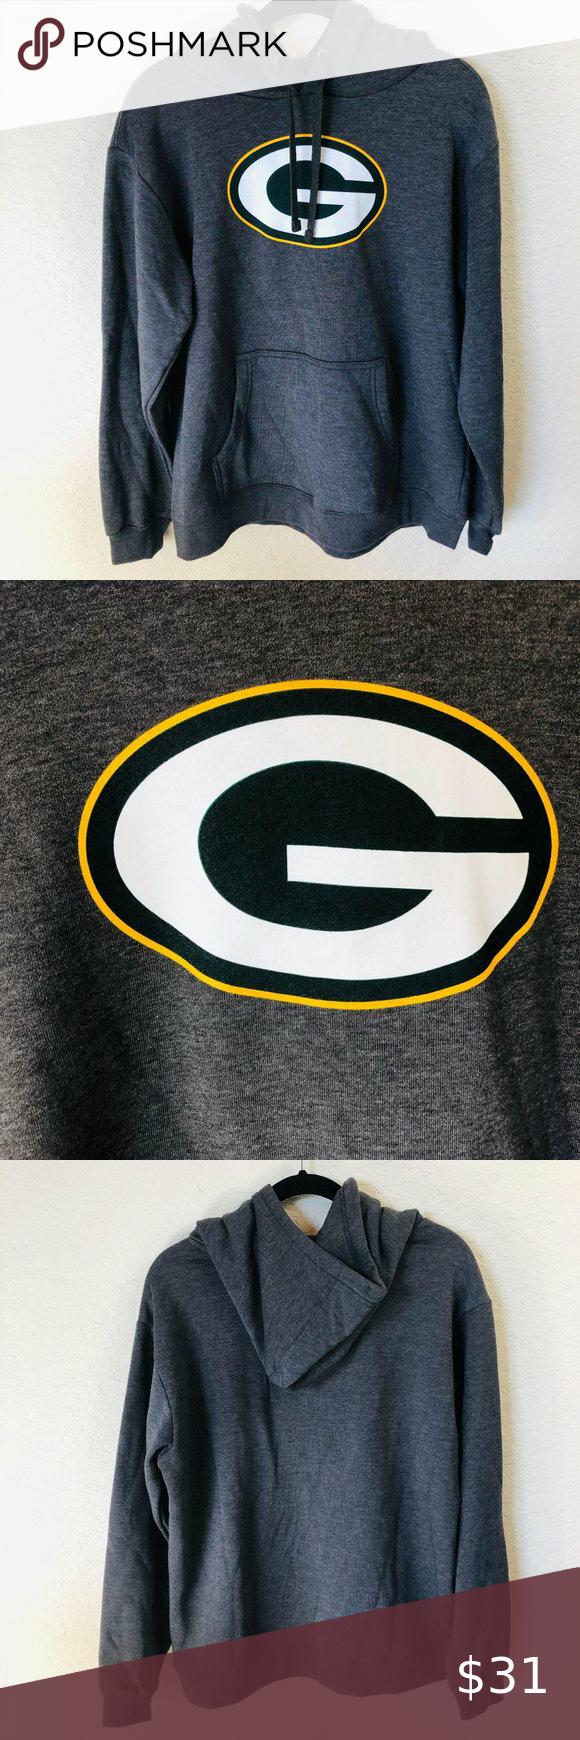 Green Bay Packers Men S Hooded Sweatshirt Size L Men S Grey Green Bay Packers Hooded Sweatshirt New Wit Hooded Sweatshirts Hooded Sweatshirt Men Sweatshirts [ 1740 x 580 Pixel ]